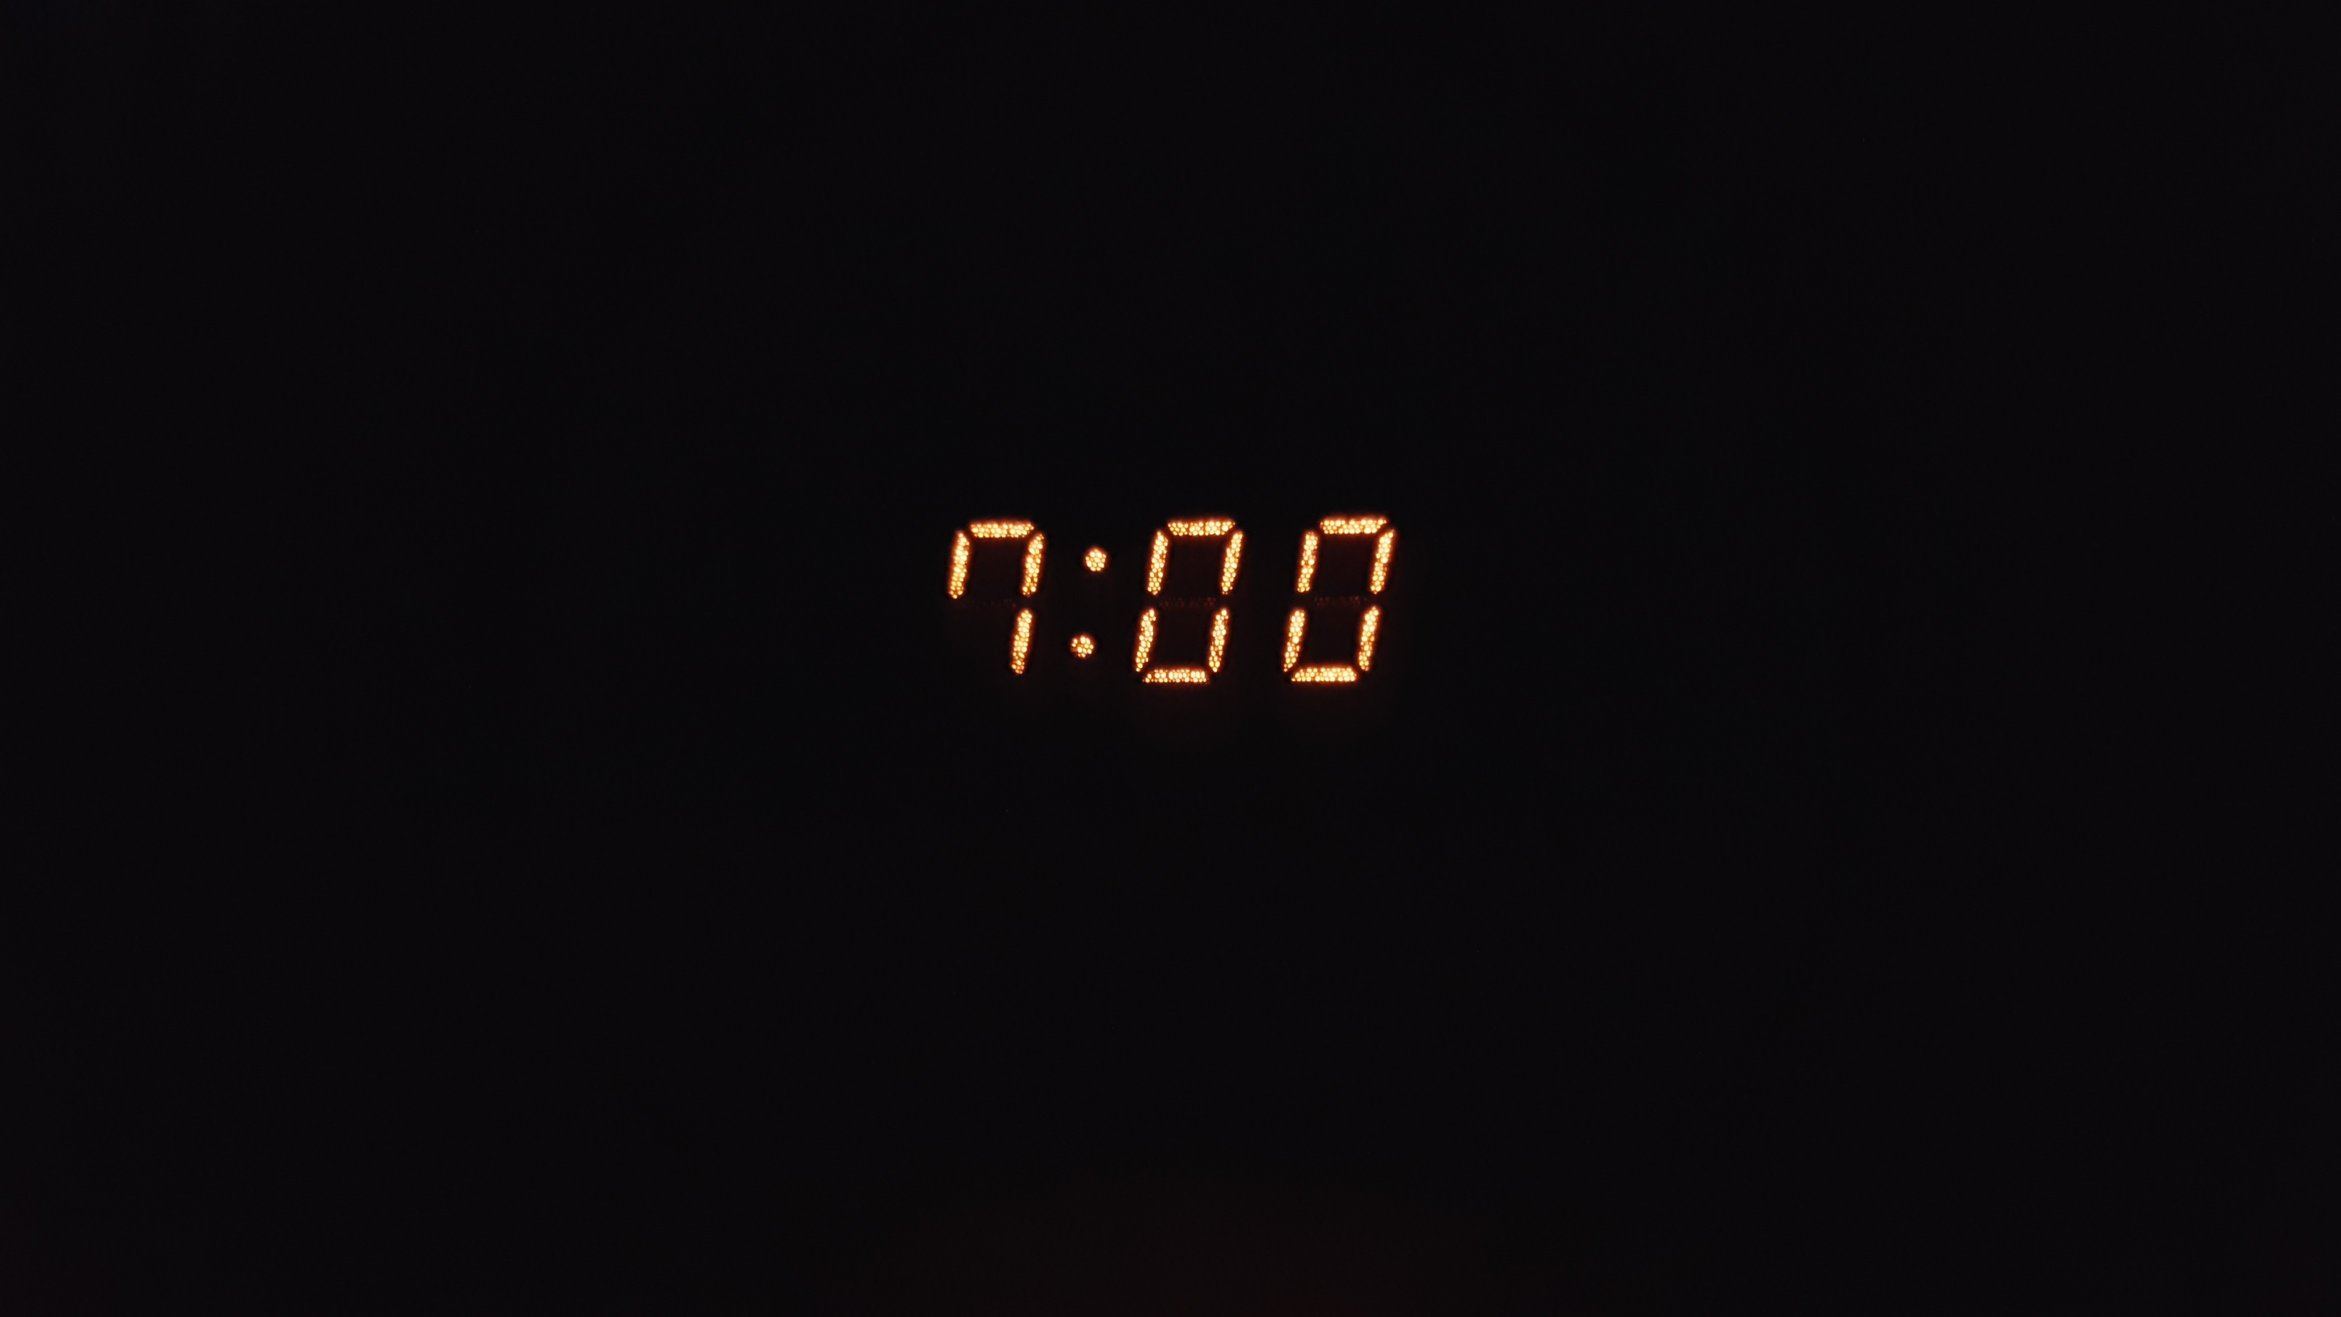 7-to-8